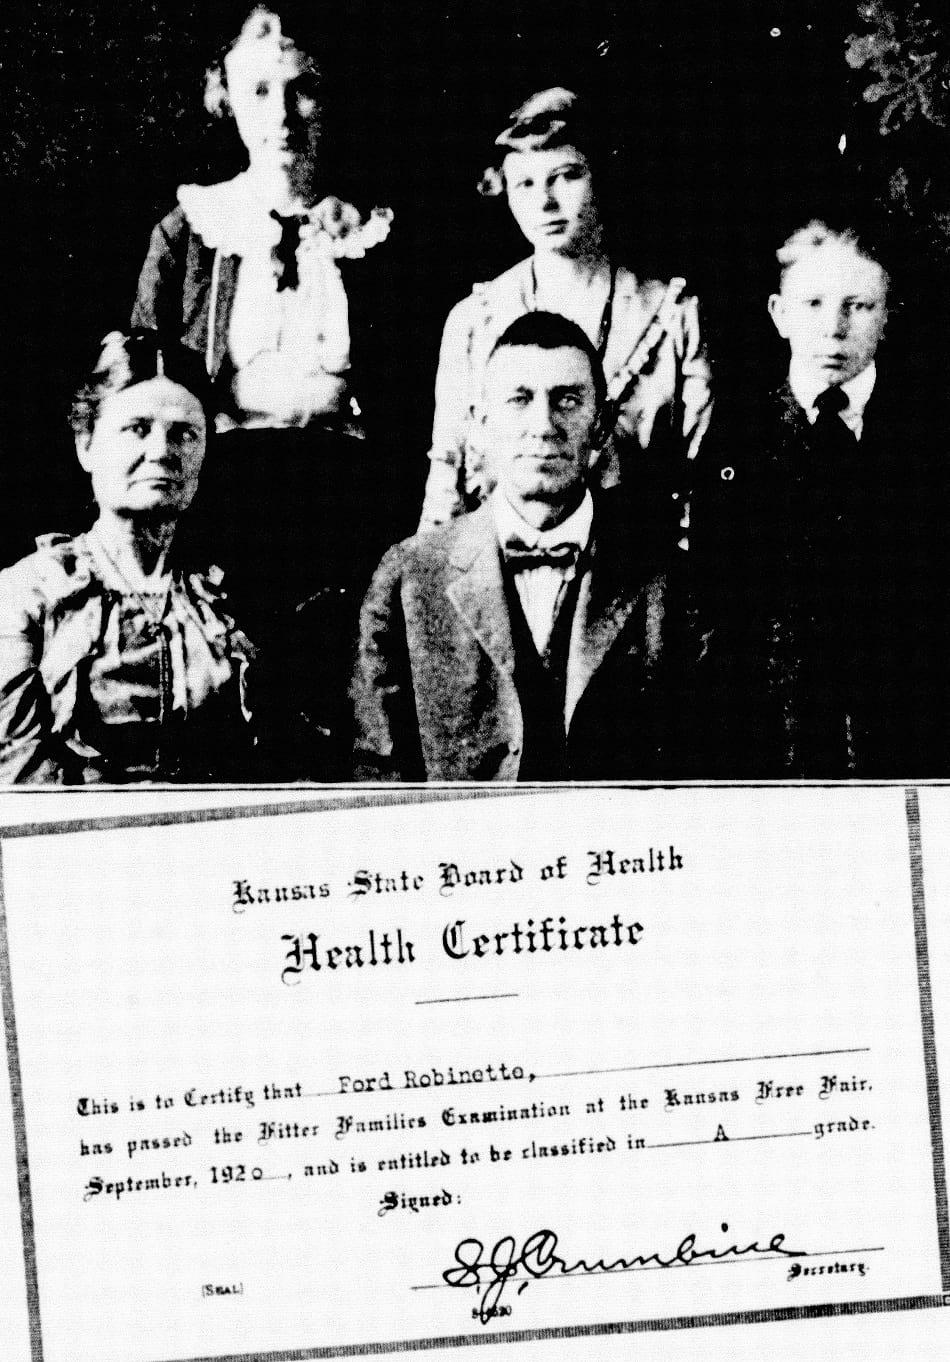 Eugenics health certificate